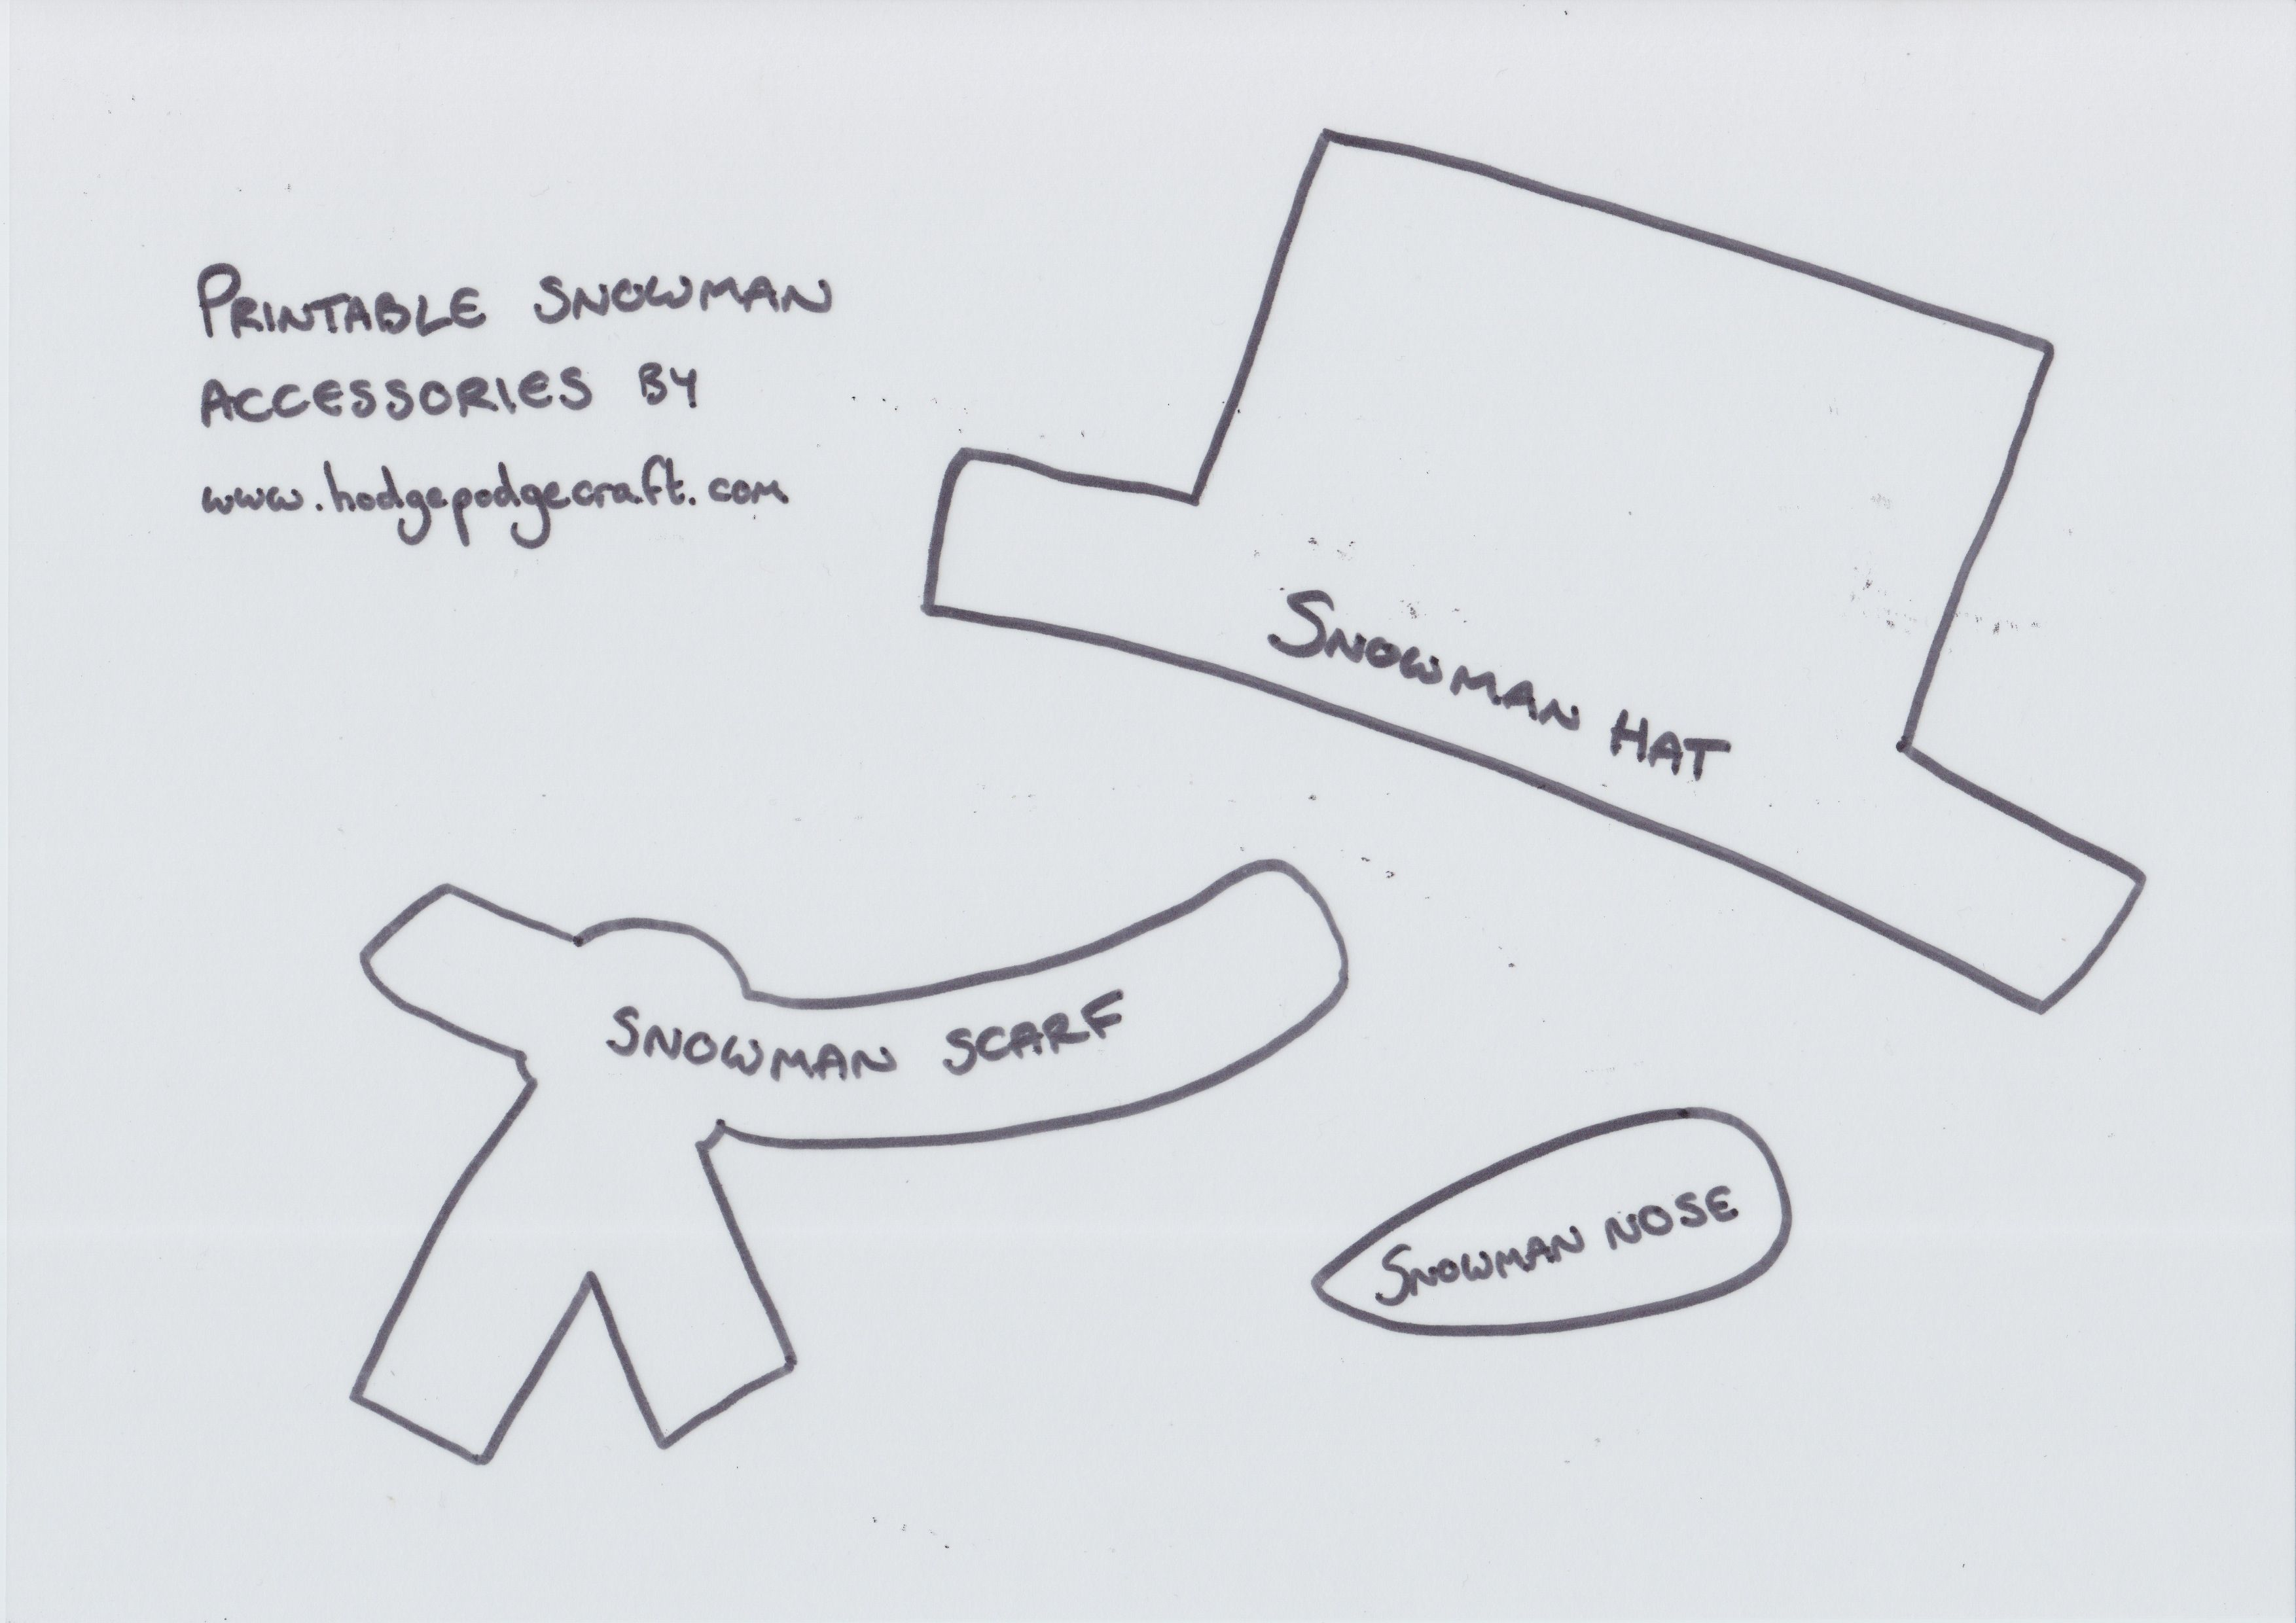 Free Printable Snowman Craft Accessories Template Jpeg 3508 2480